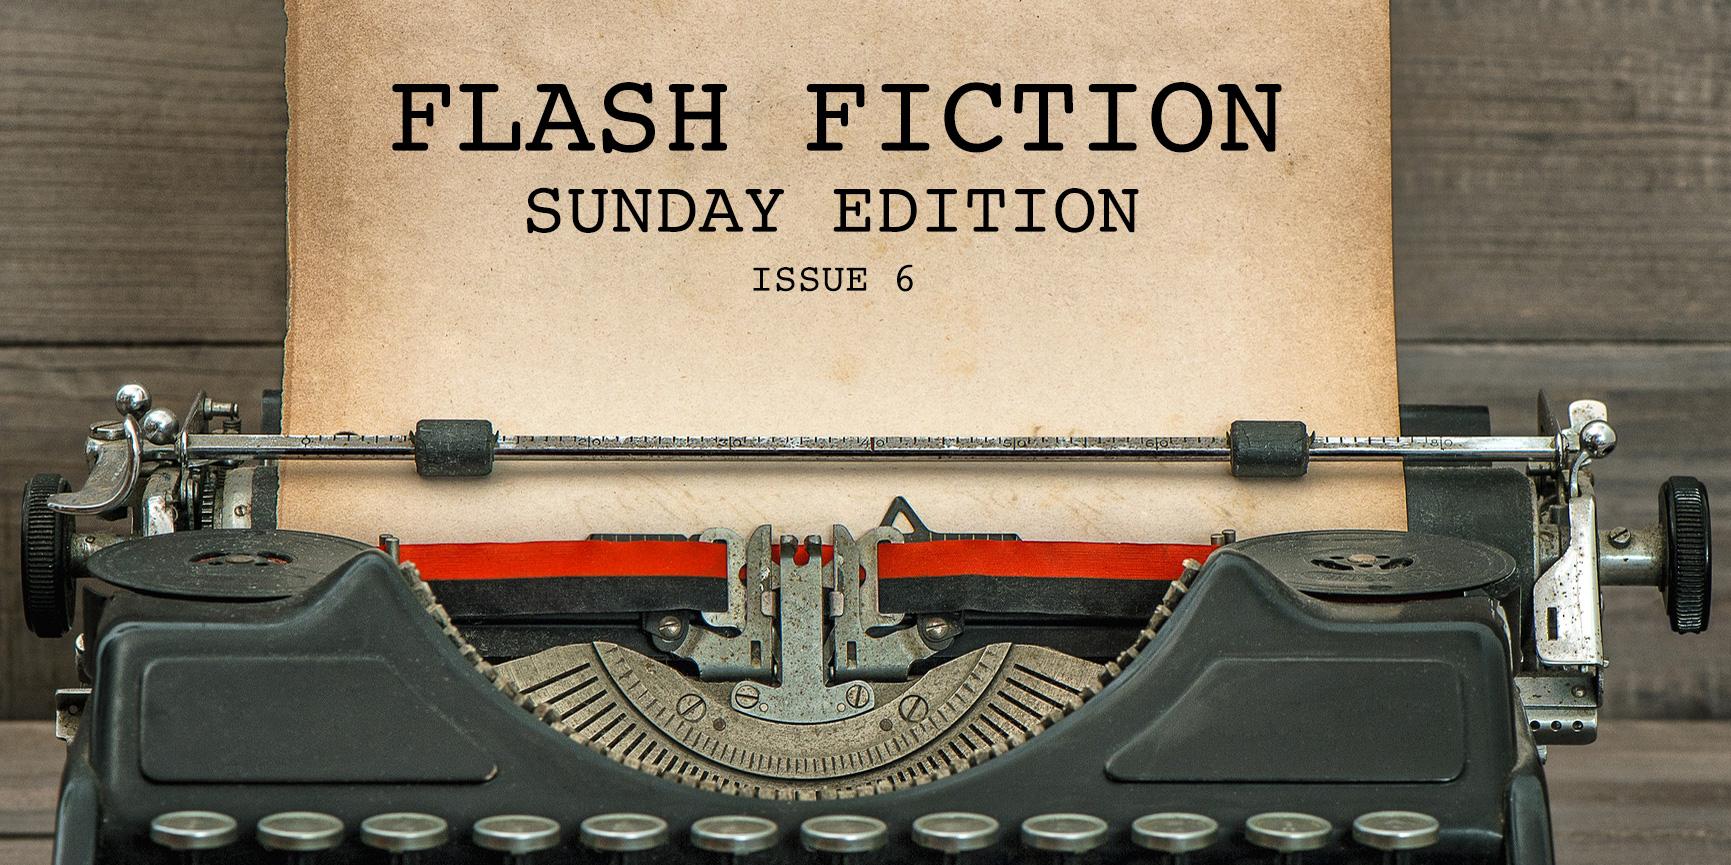 Flash Fiction Sunday Edition - Issue 6